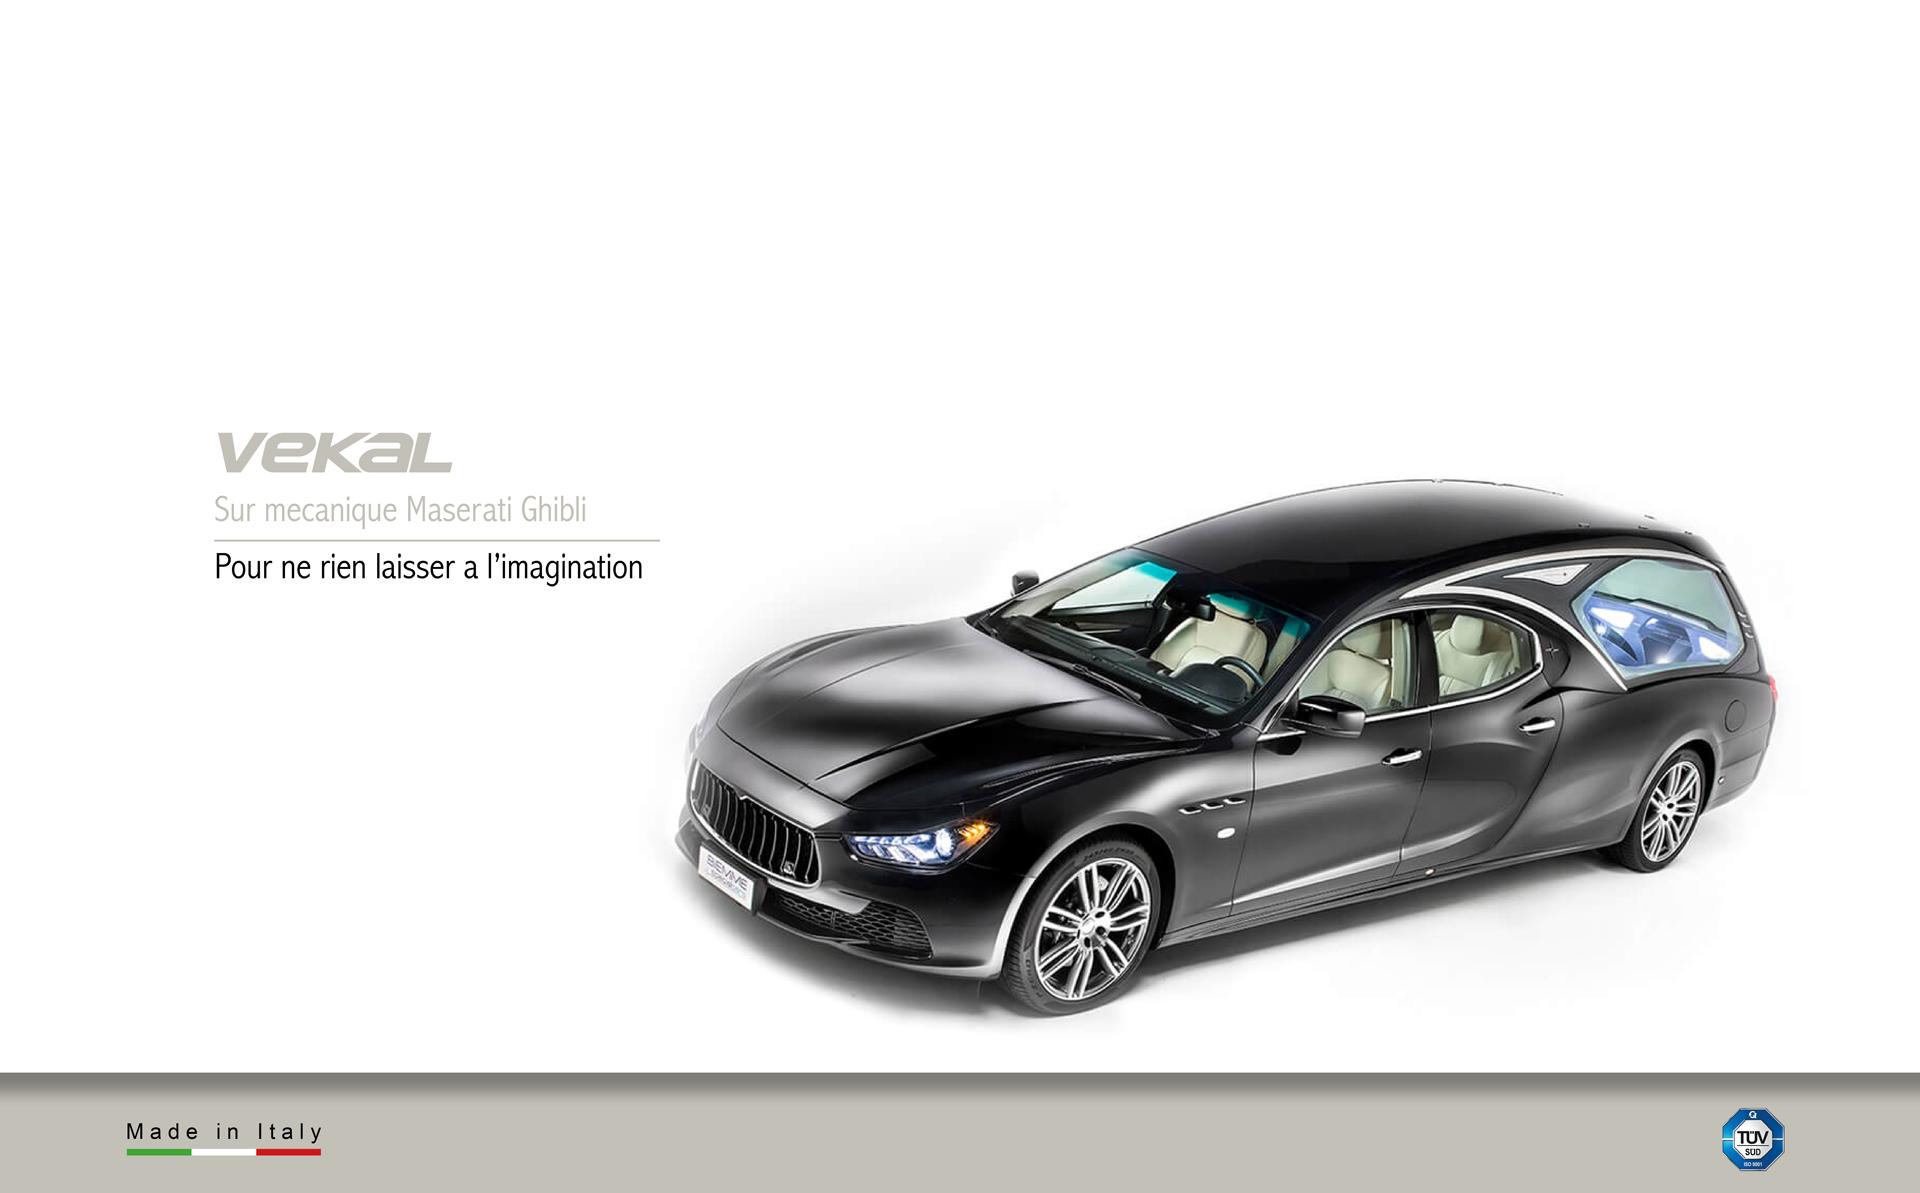 Corbillard sur mecanique Maserati Ghibli